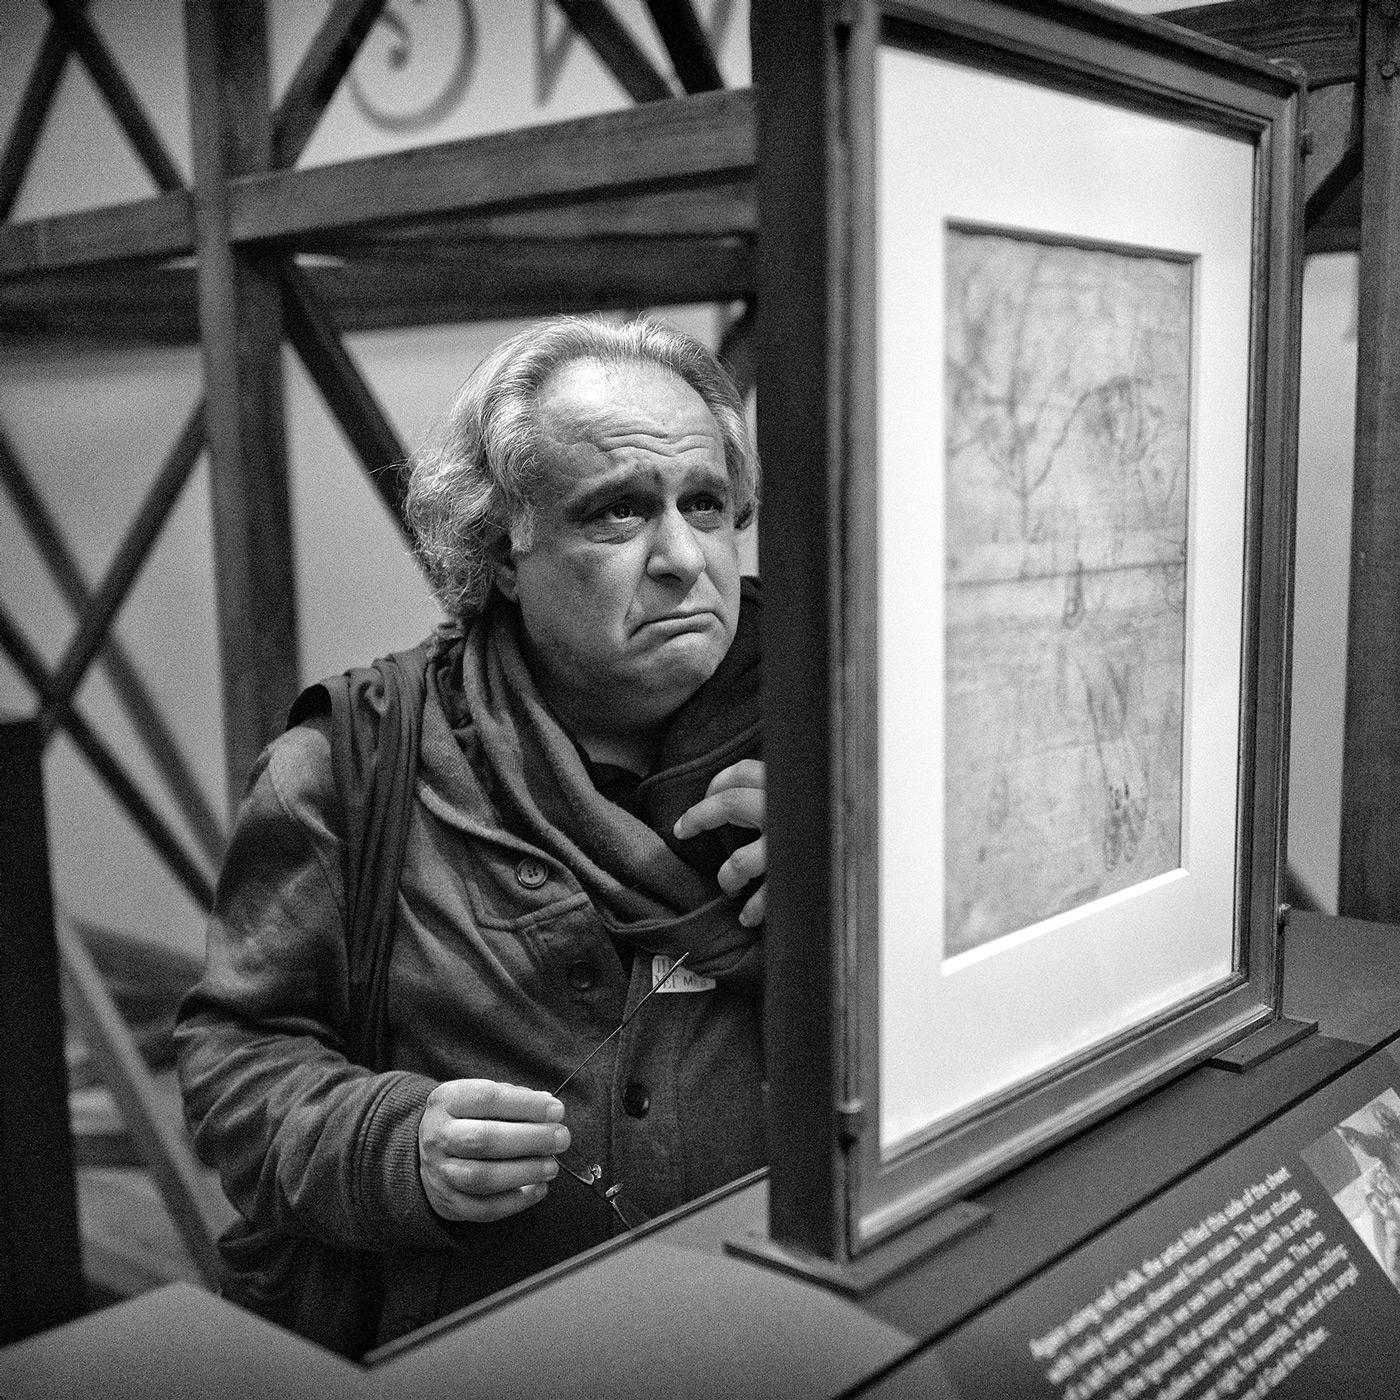 William-Bullard_USA_Pictures-at-an-Exhibition_13.jpeg